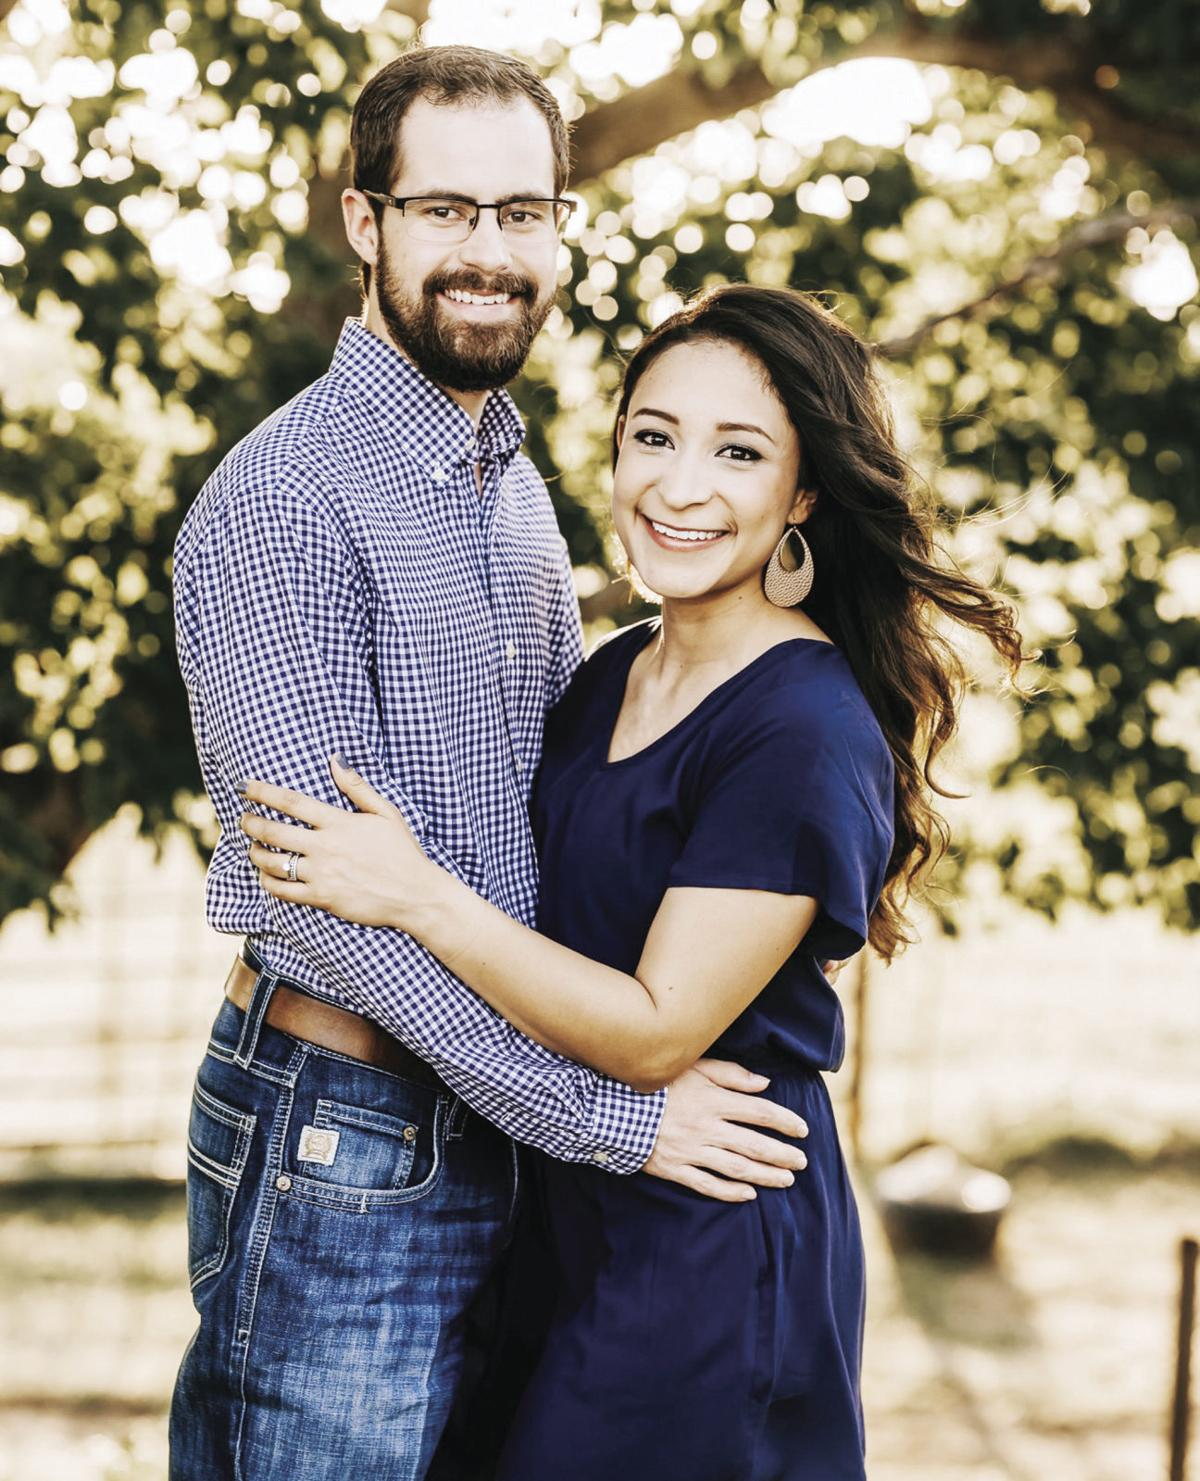 Davis family chosen as Farm Family of the Year